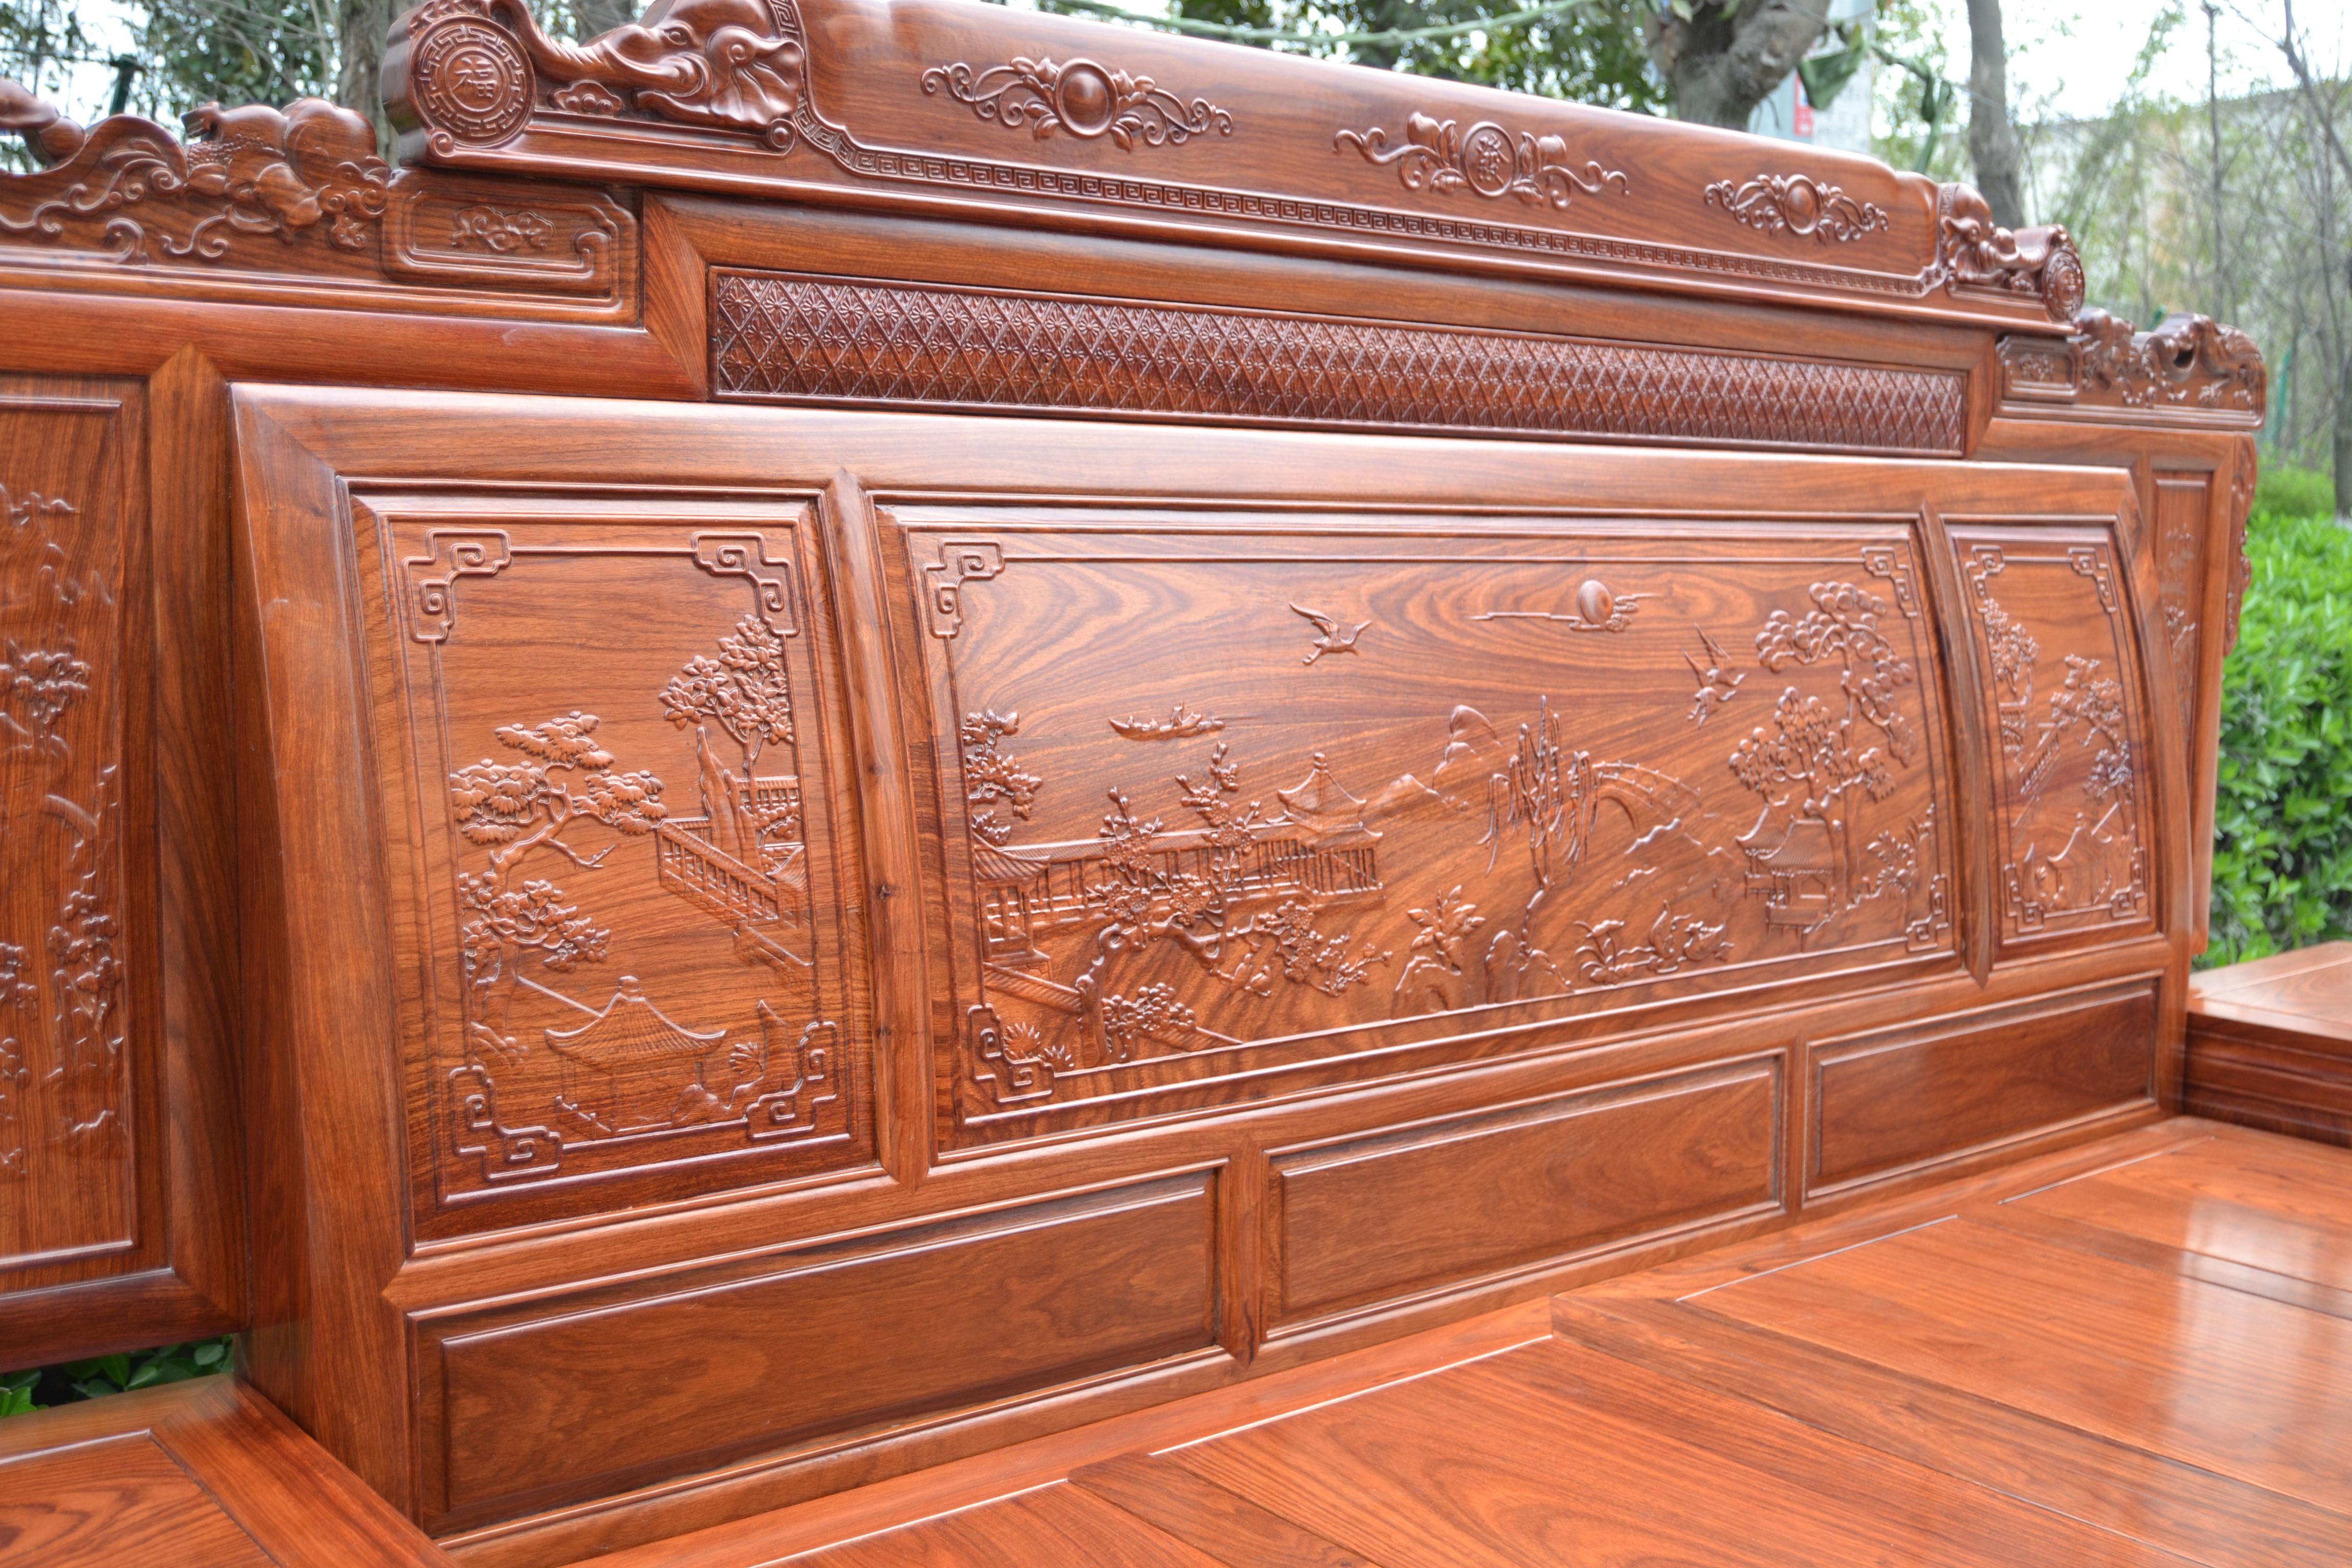 Mahogany bed 1.8 meters of antique Ming and Qing furniture mahogany mahogany wood double bed sandalwood Hedgehog